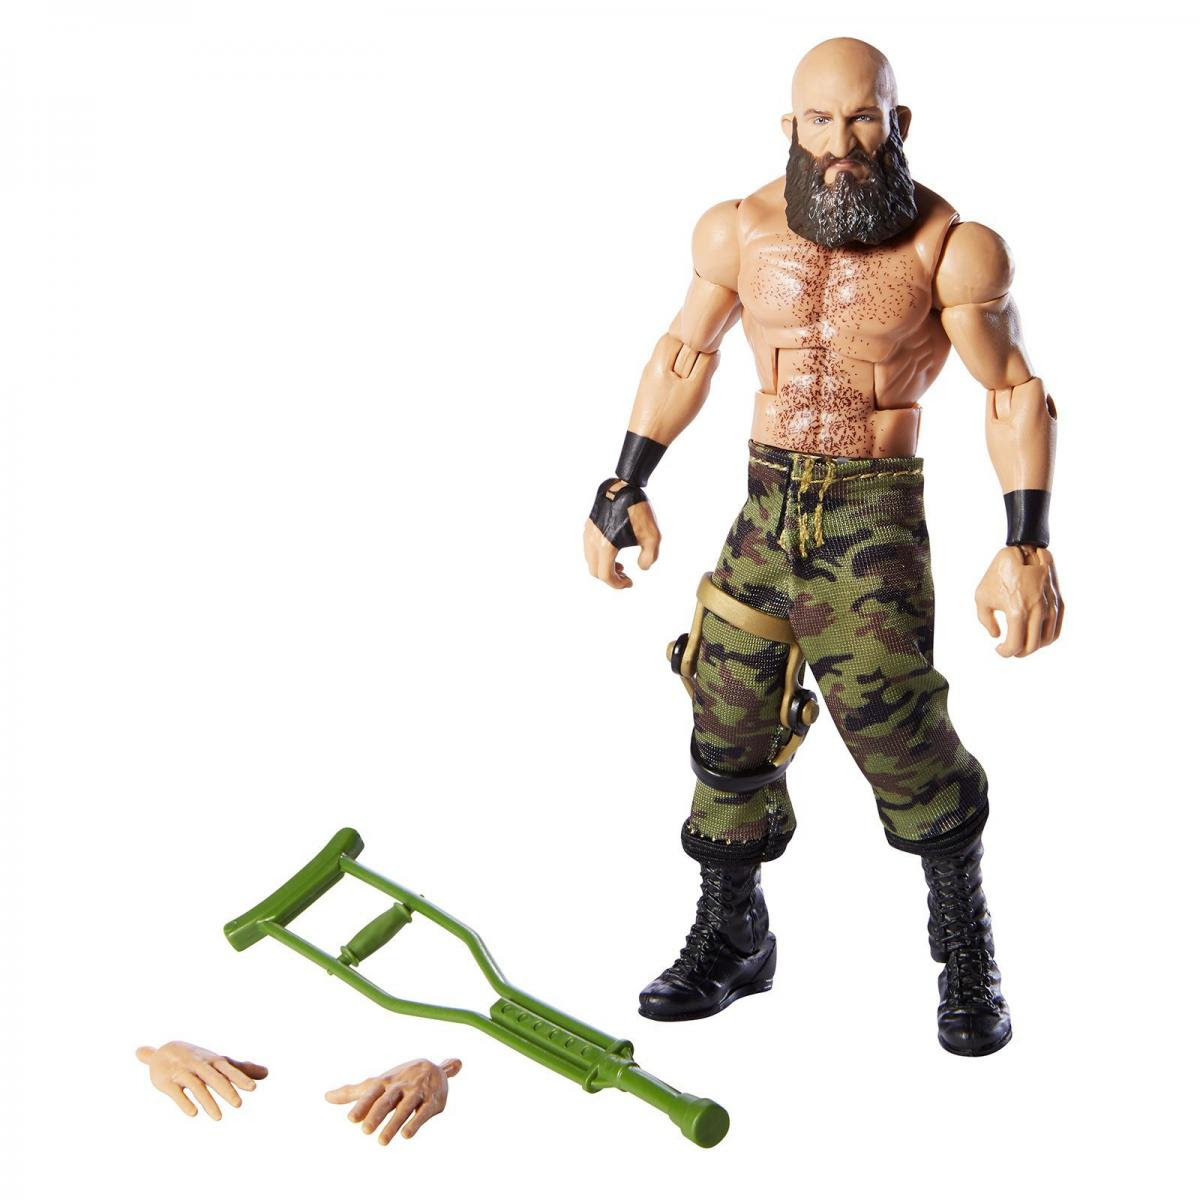 Image of WWE Wrestling Elite Series 69 - Tommaso Ciampa Action Figure